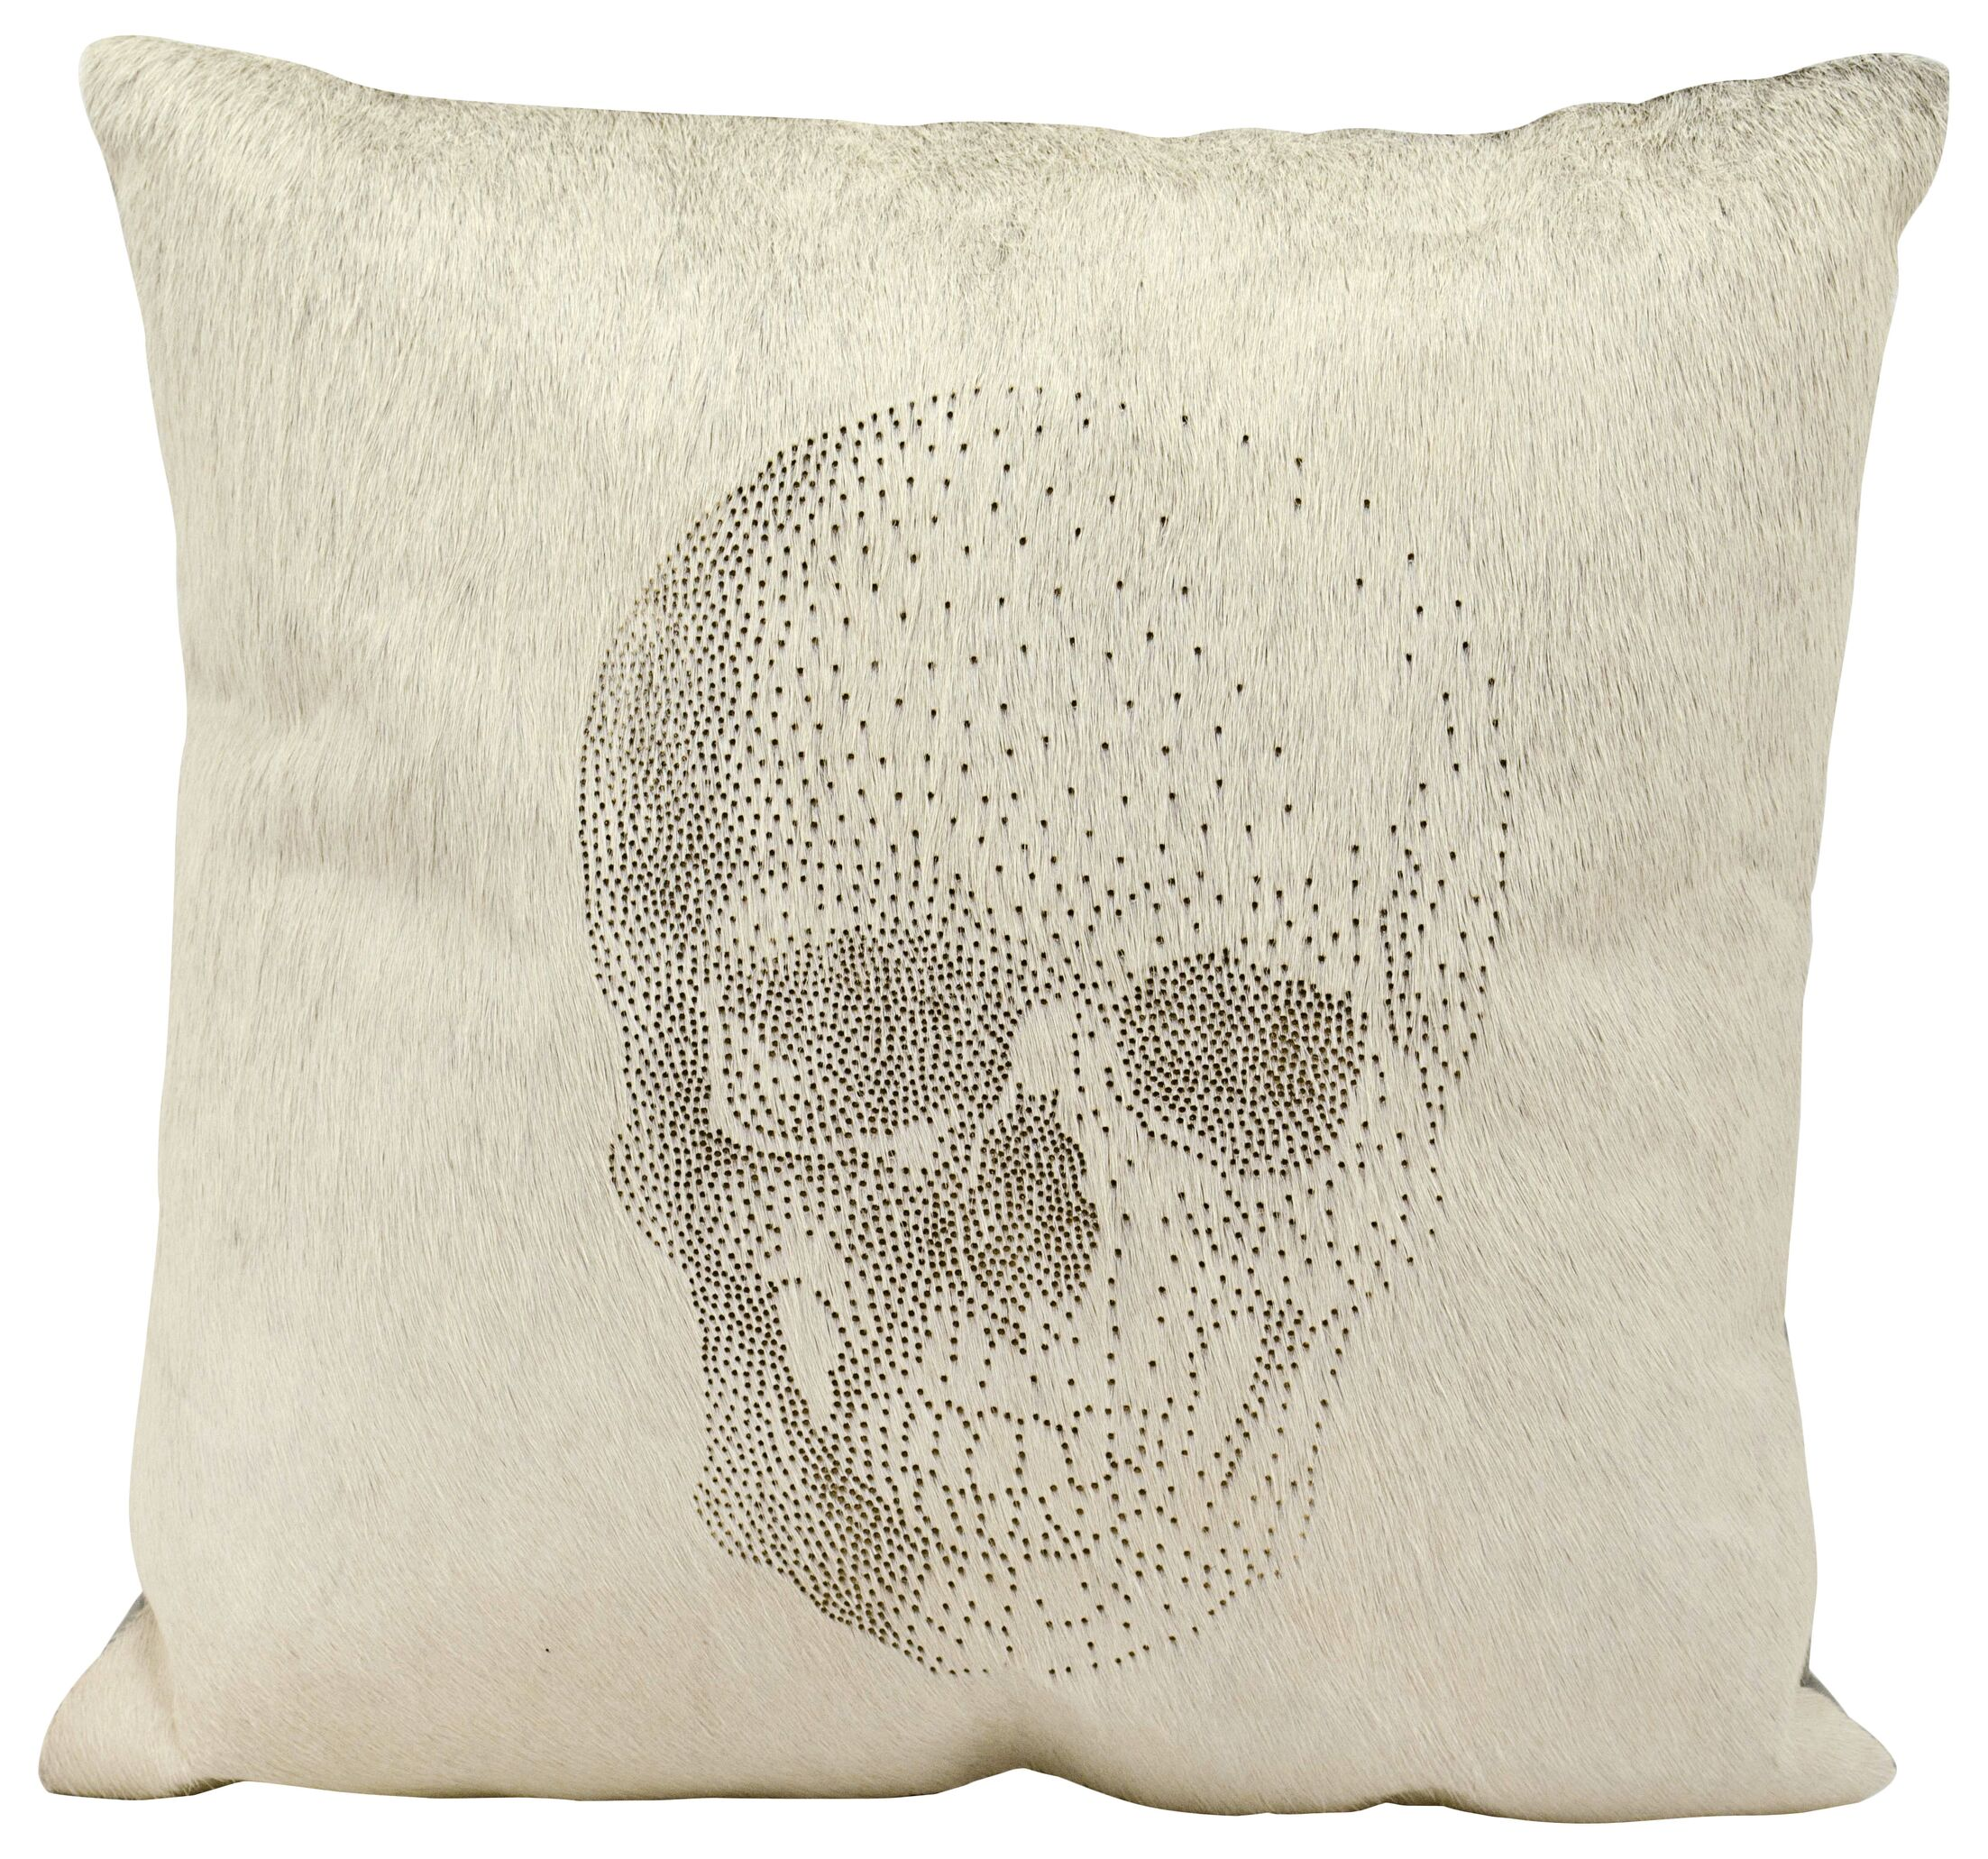 Ince Throw Pillow